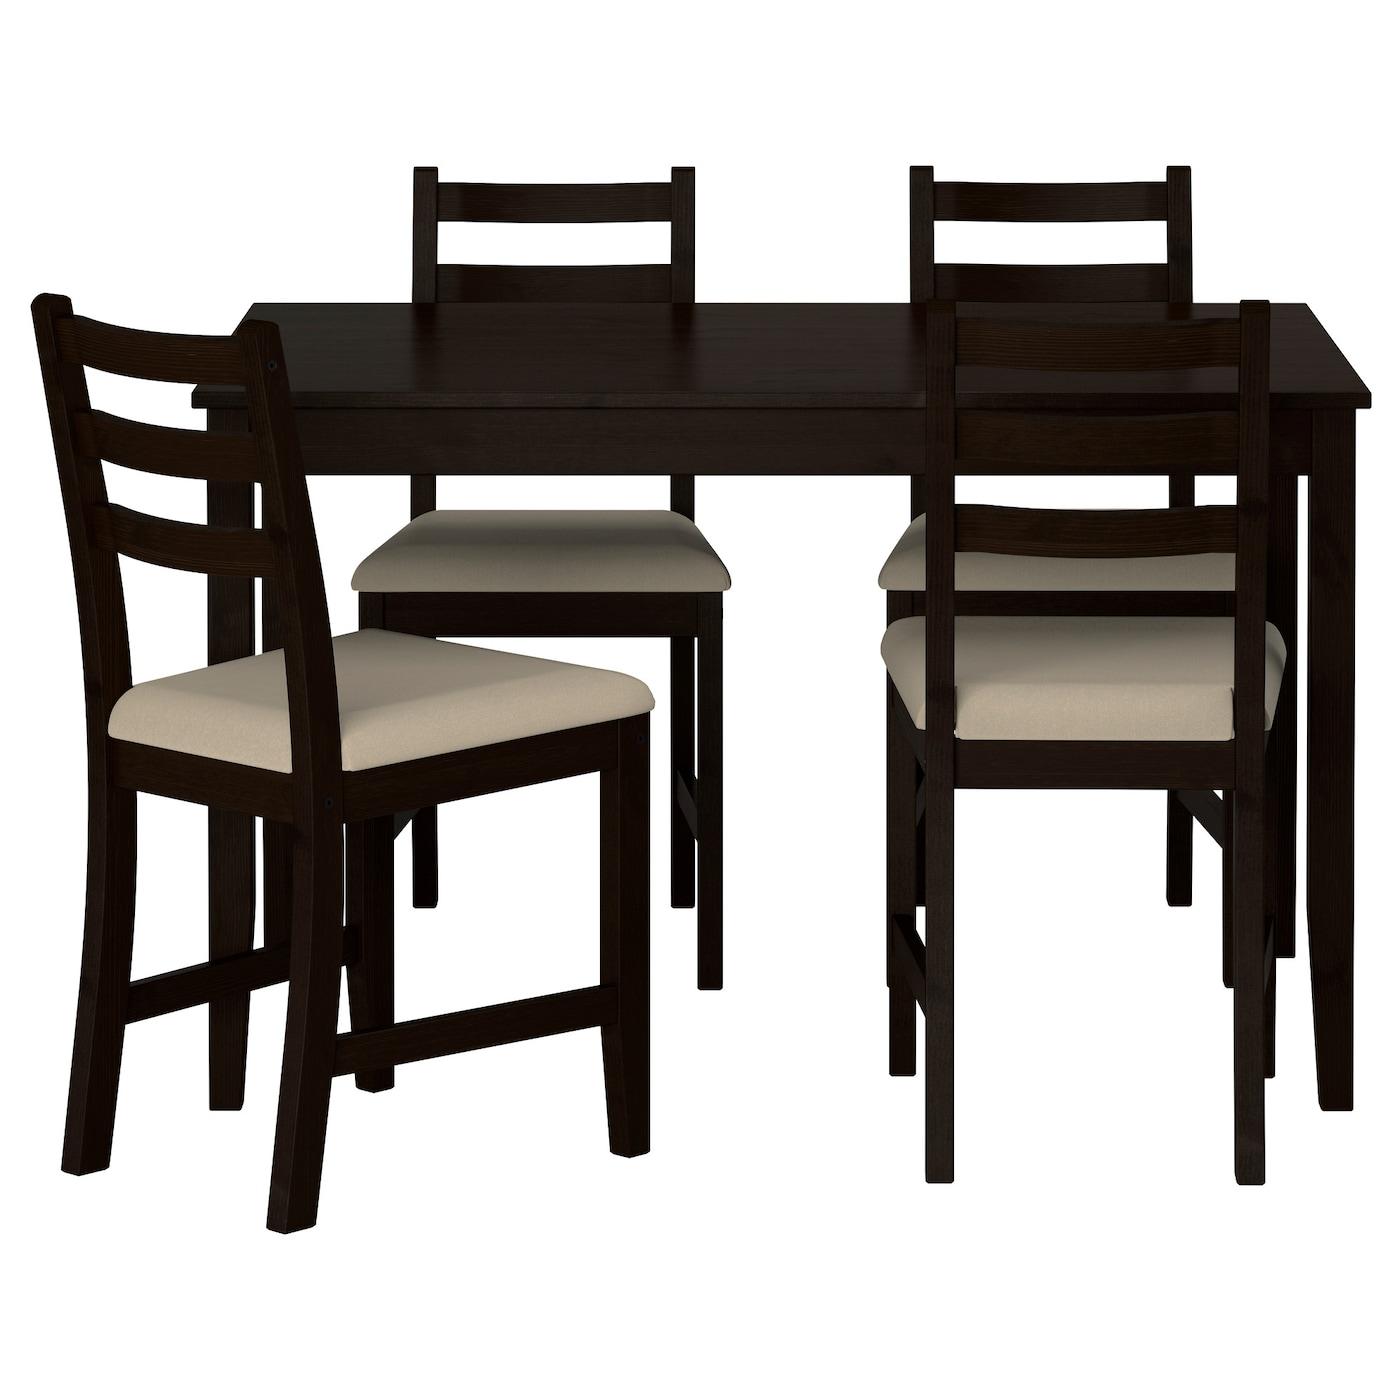 Lerhamn mesa con 4 sillas negro marr n vittaryd beige 118 x 74 cm ikea - Sillas con reposabrazos ikea ...